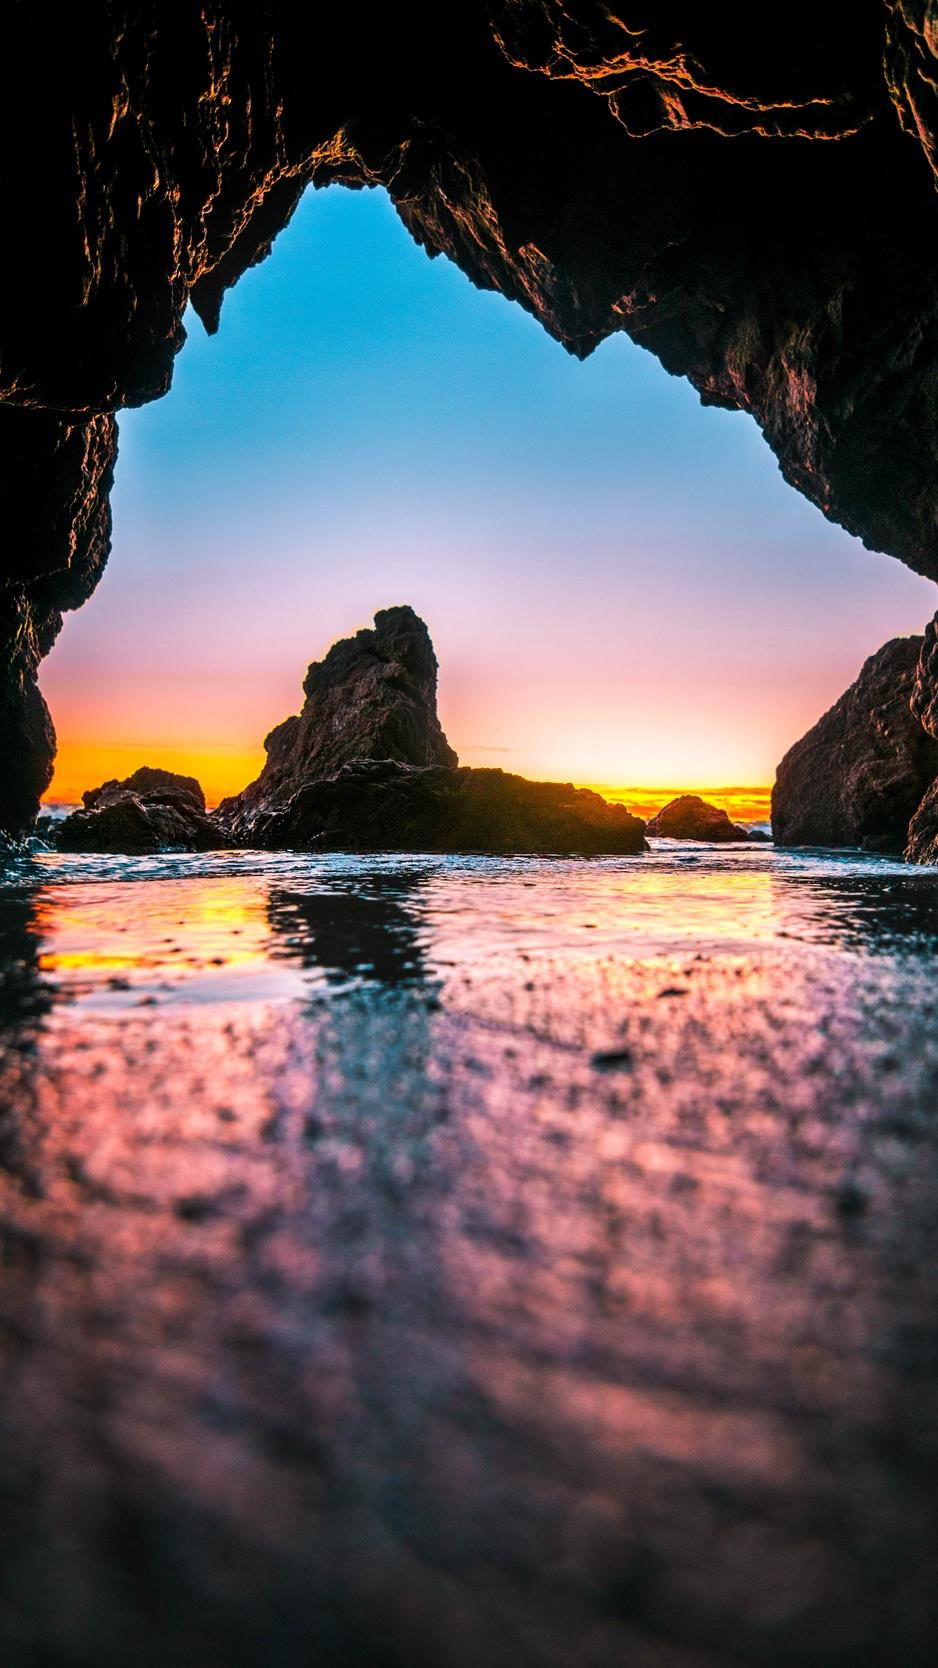 Wallpaper Cave Tide Stones Sea Iphone Cave 938x1668 Wallpaper Teahub Io